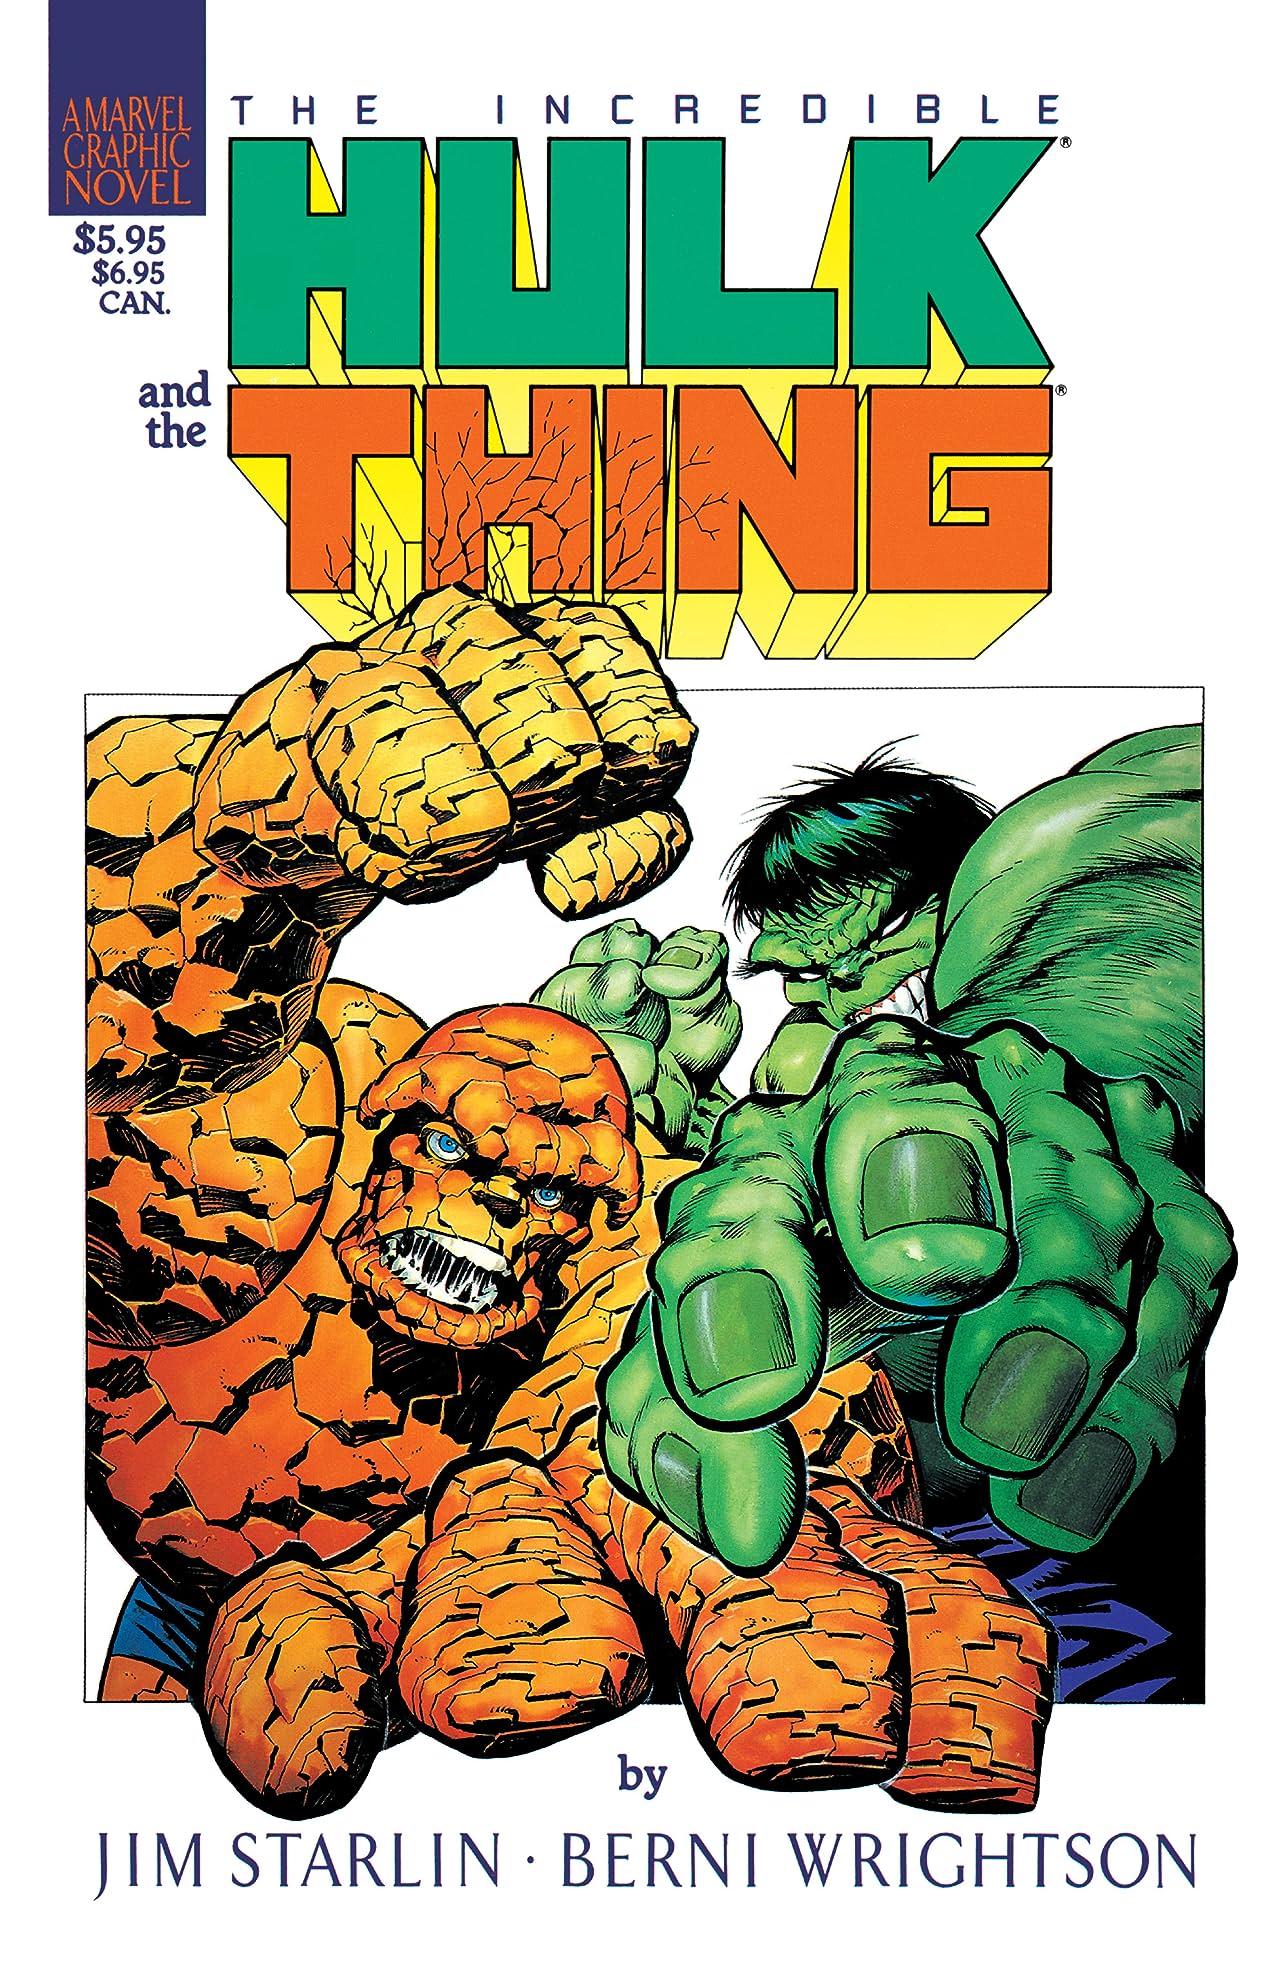 Marvel Graphic Novel #29: Hulk/Thing - The Big Change